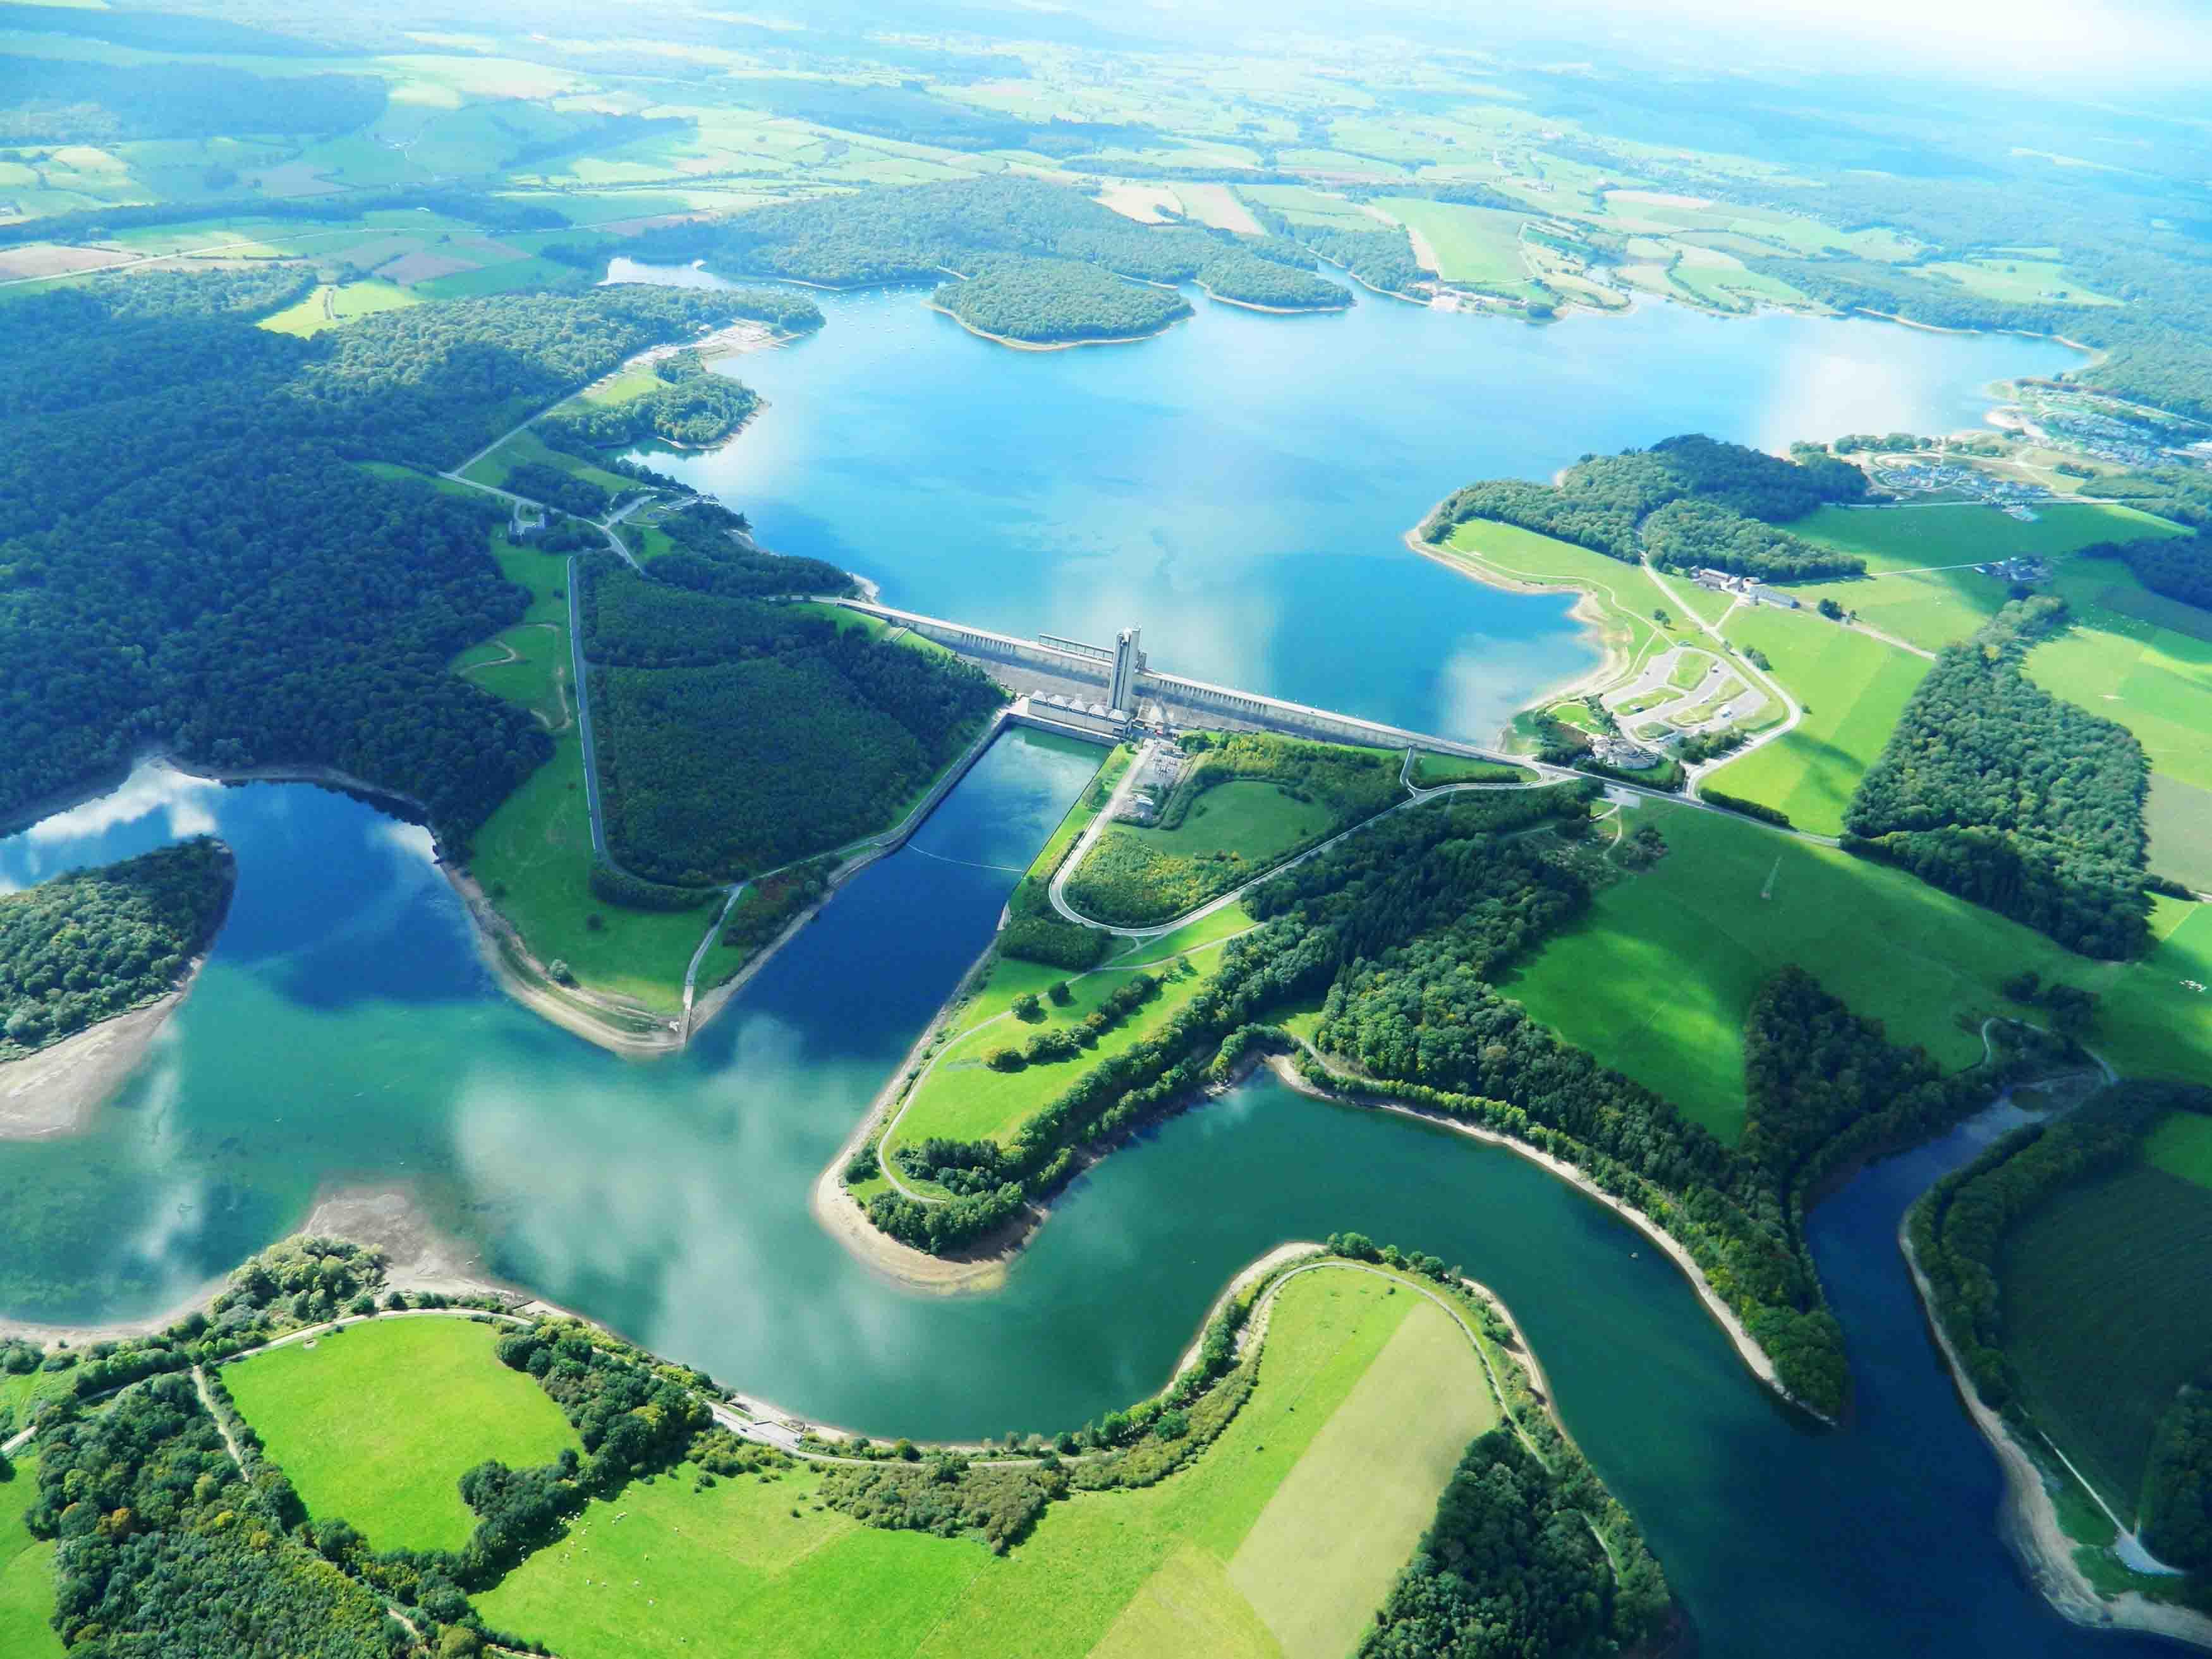 Les Lacs de l'Eau d'Heure